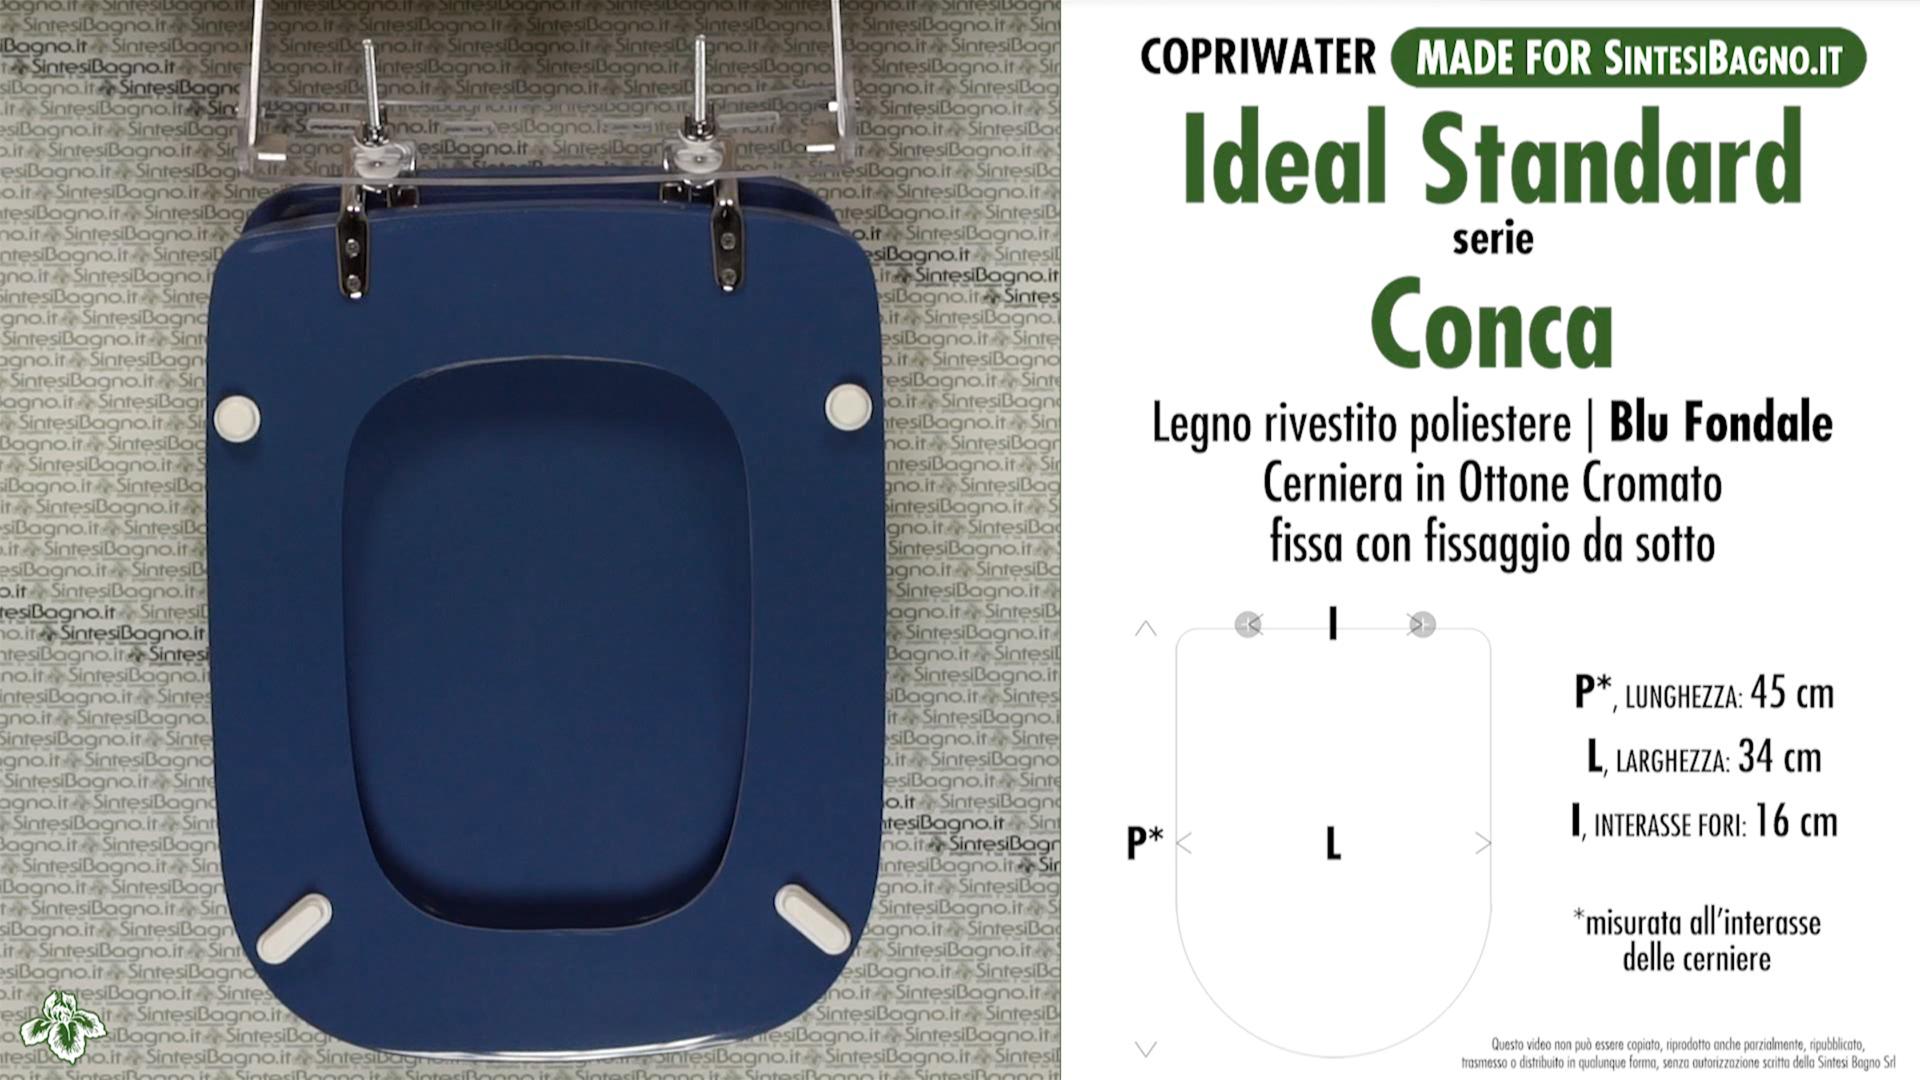 Copriwater per vaso conca ideal standard blu fondale for Copriwater conca ideal standard originale